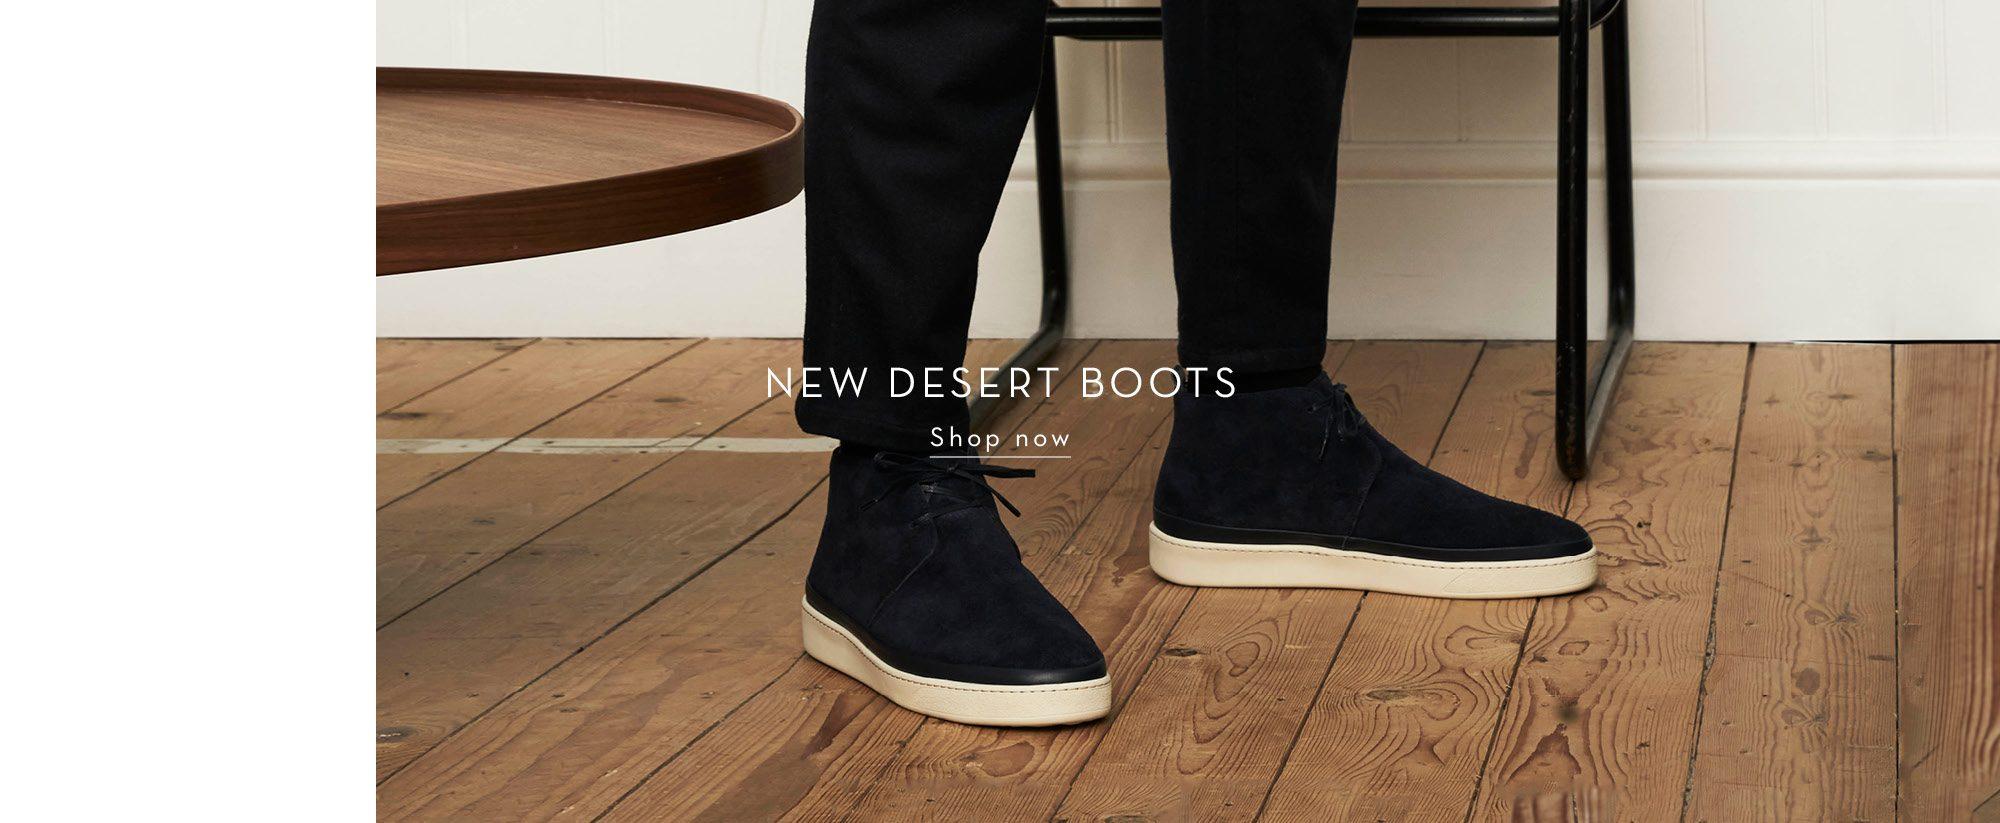 New Season Suede Desert Boots for Men - mobile